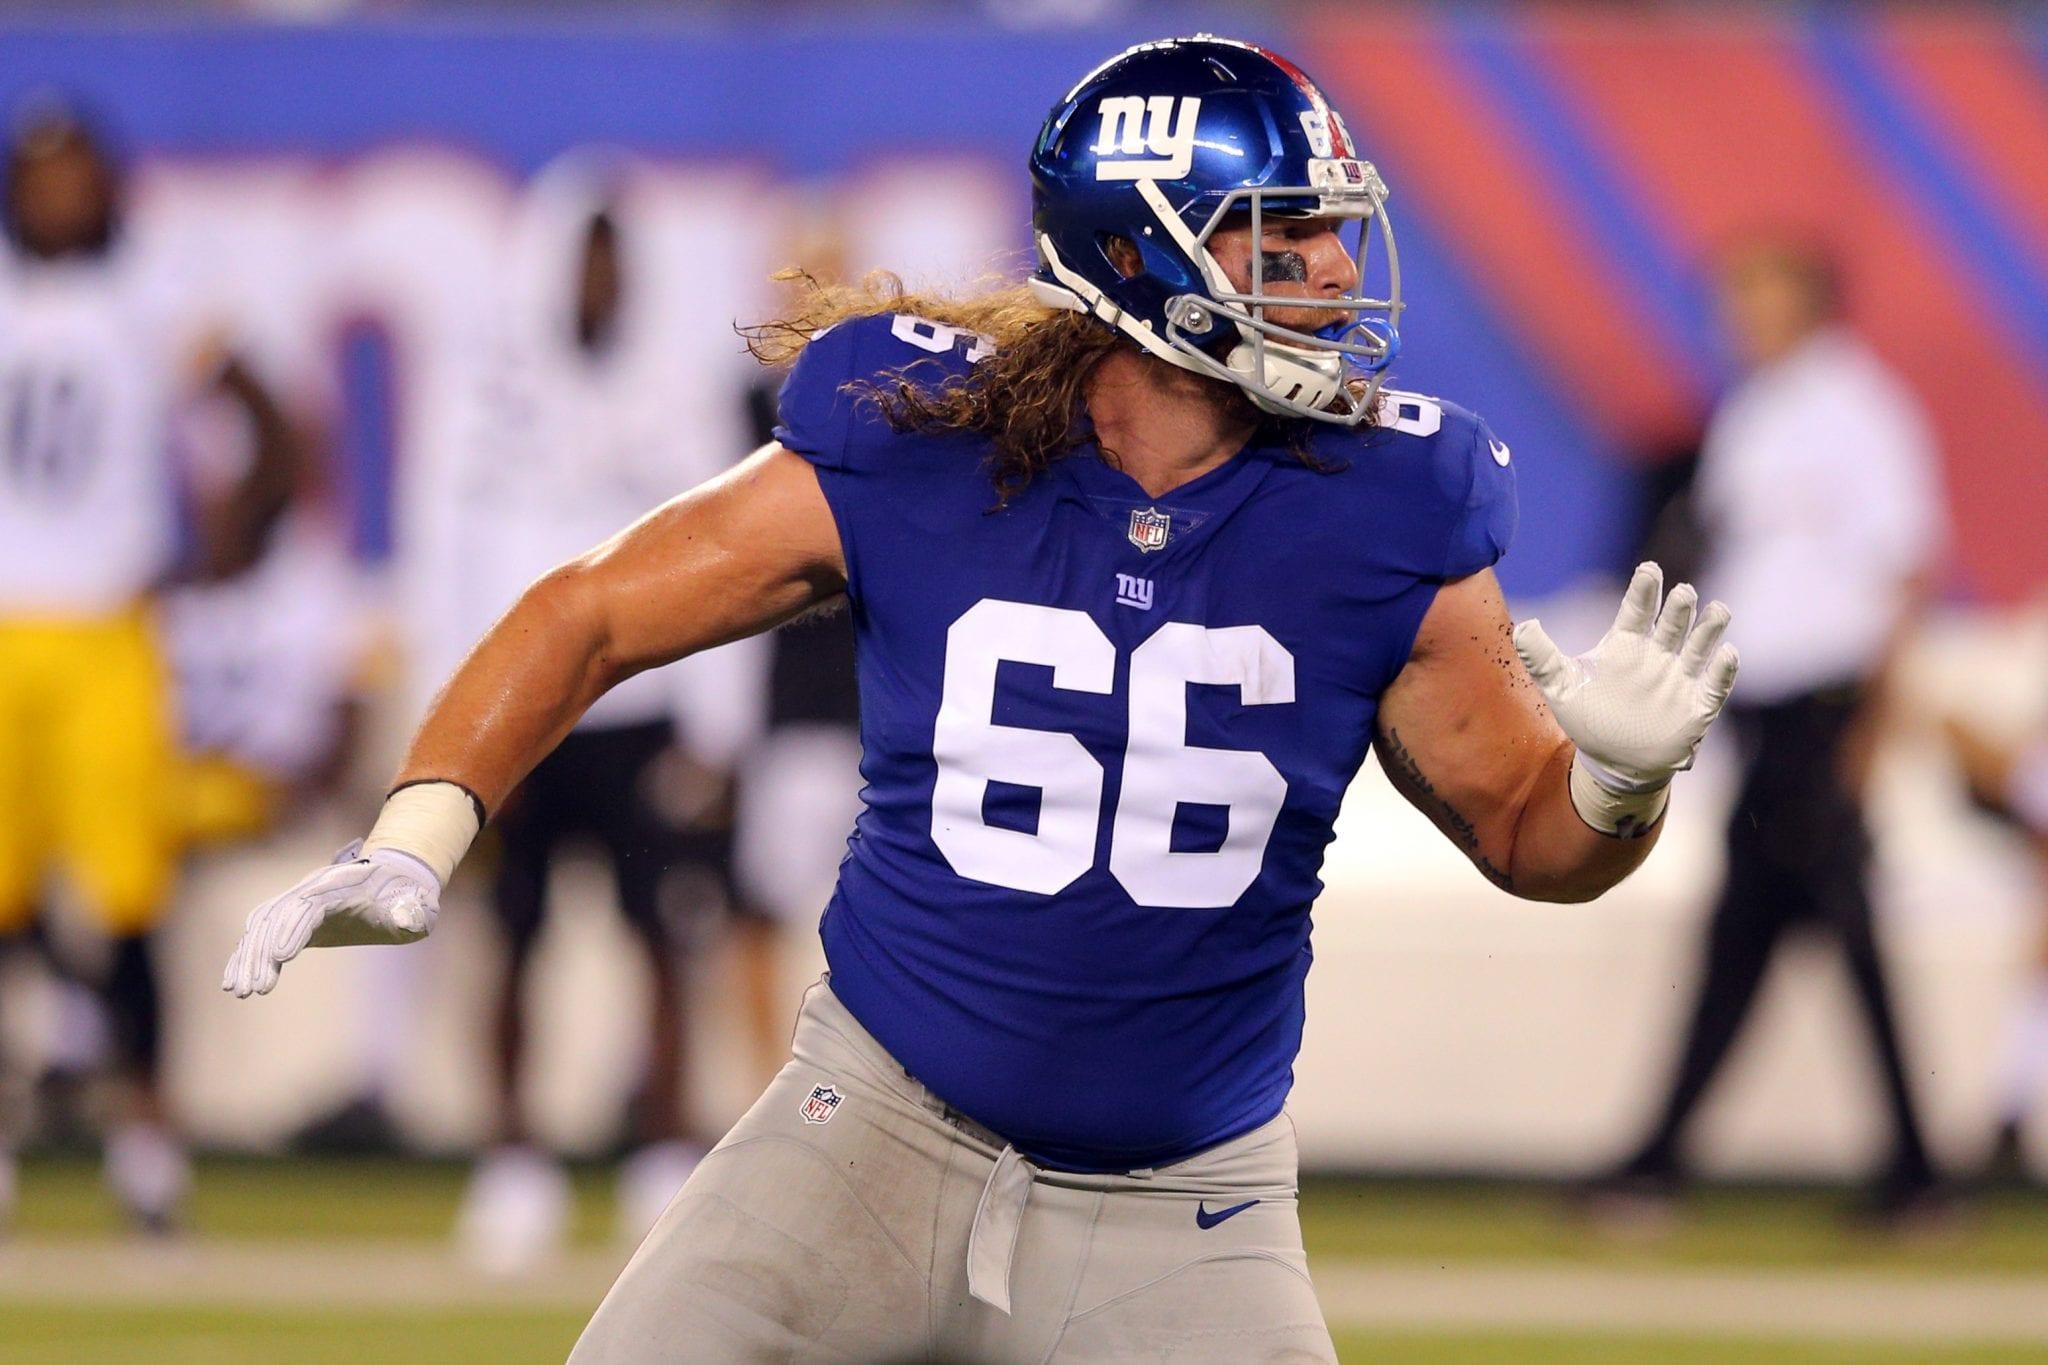 f8eb518cdcd New York Giants Make Roster Cuts, Including 2017 Pick Bisnowaty